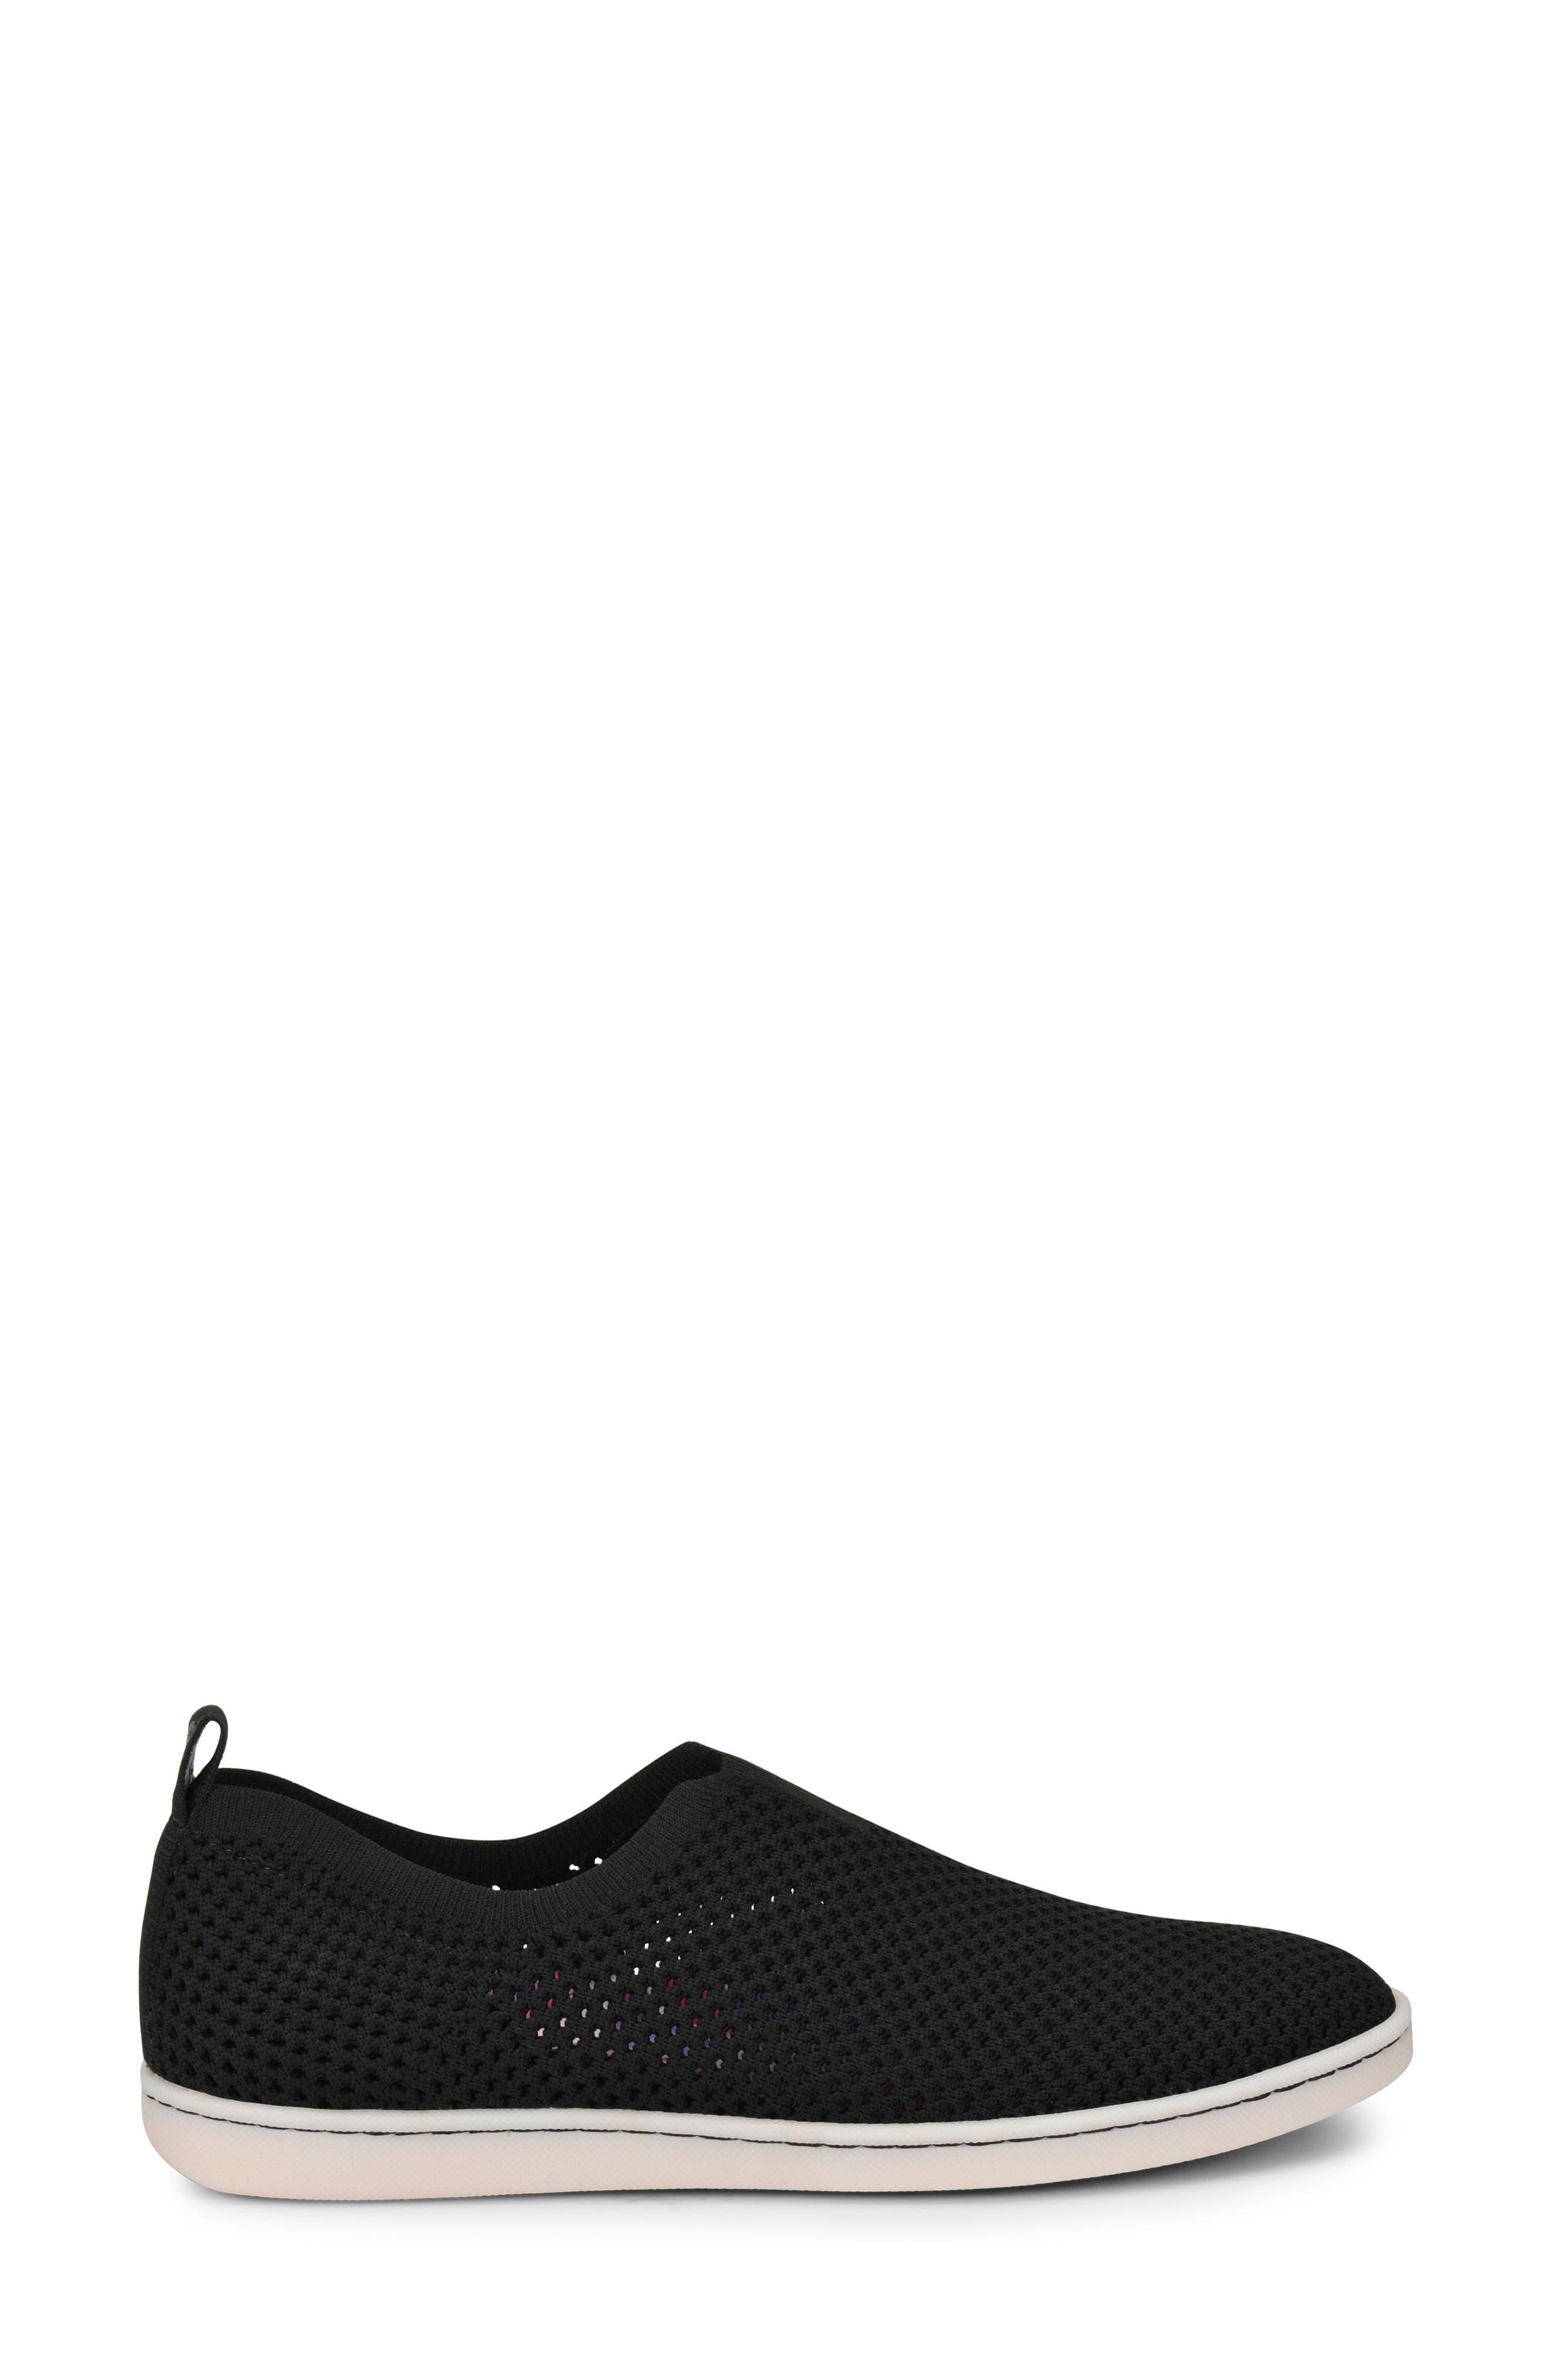 Hazy Slip-On Sneaker,                             Alternate thumbnail 3, color,                             Black Fabric